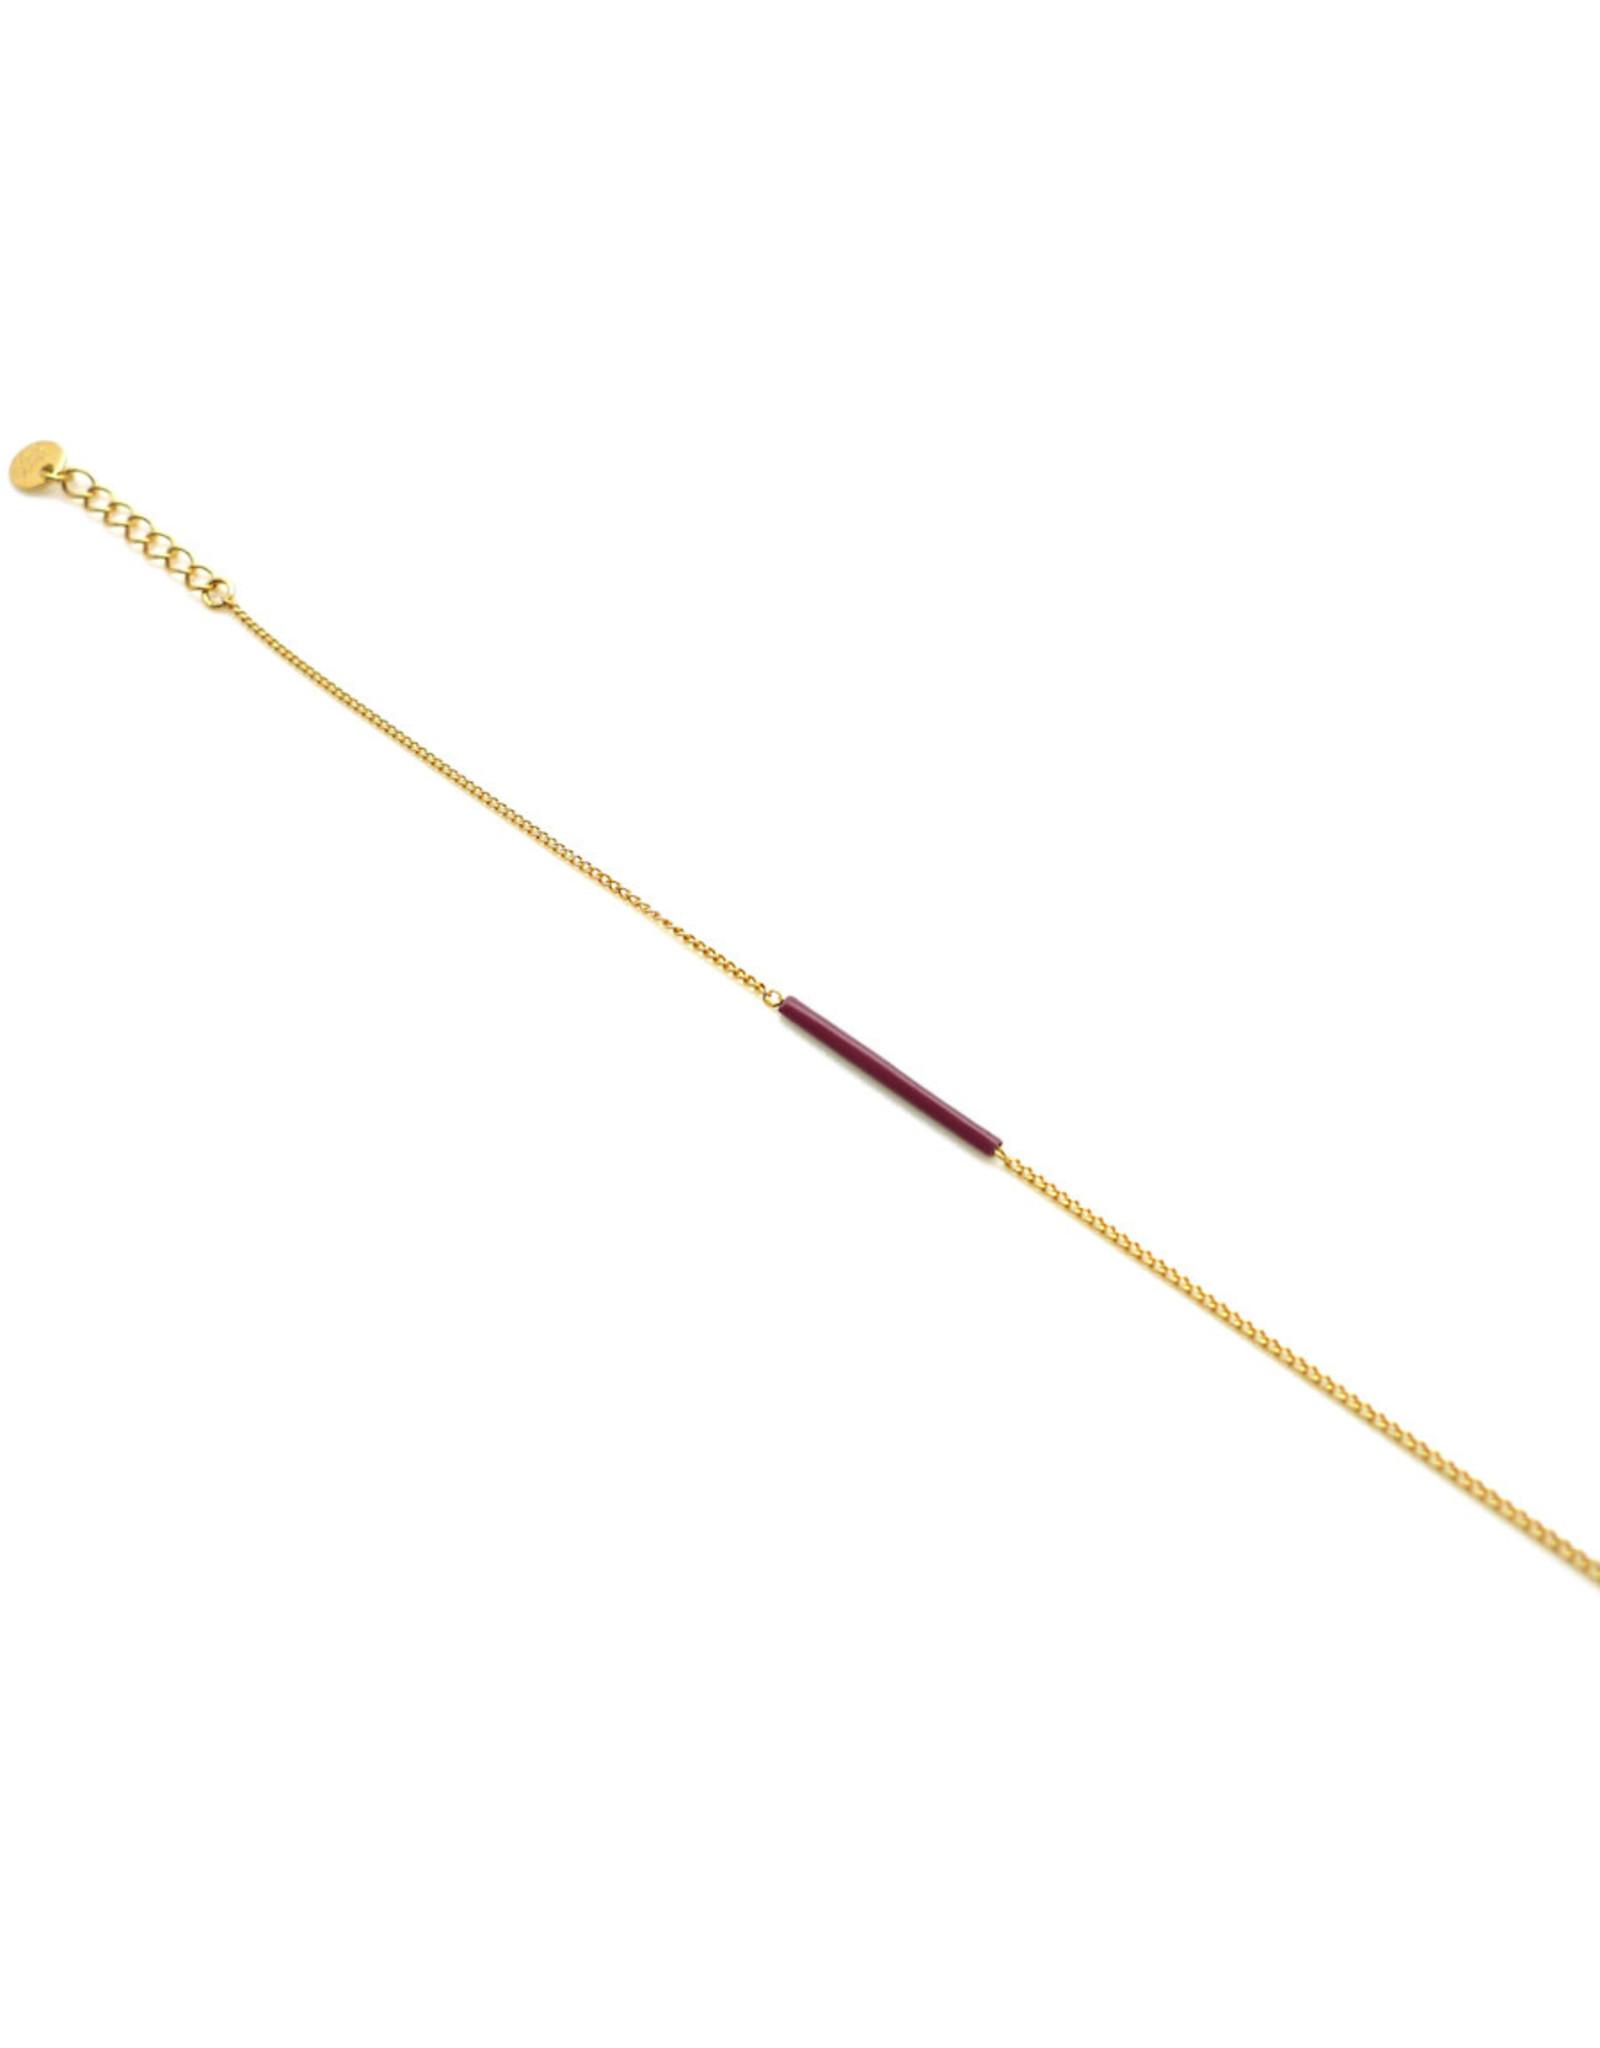 Nadja Carlotti Armband Sparkle - Bordeaux  - Messing verguld  - Lengt 16 cm + 2 cm - Tube 2 x 0,2 cm